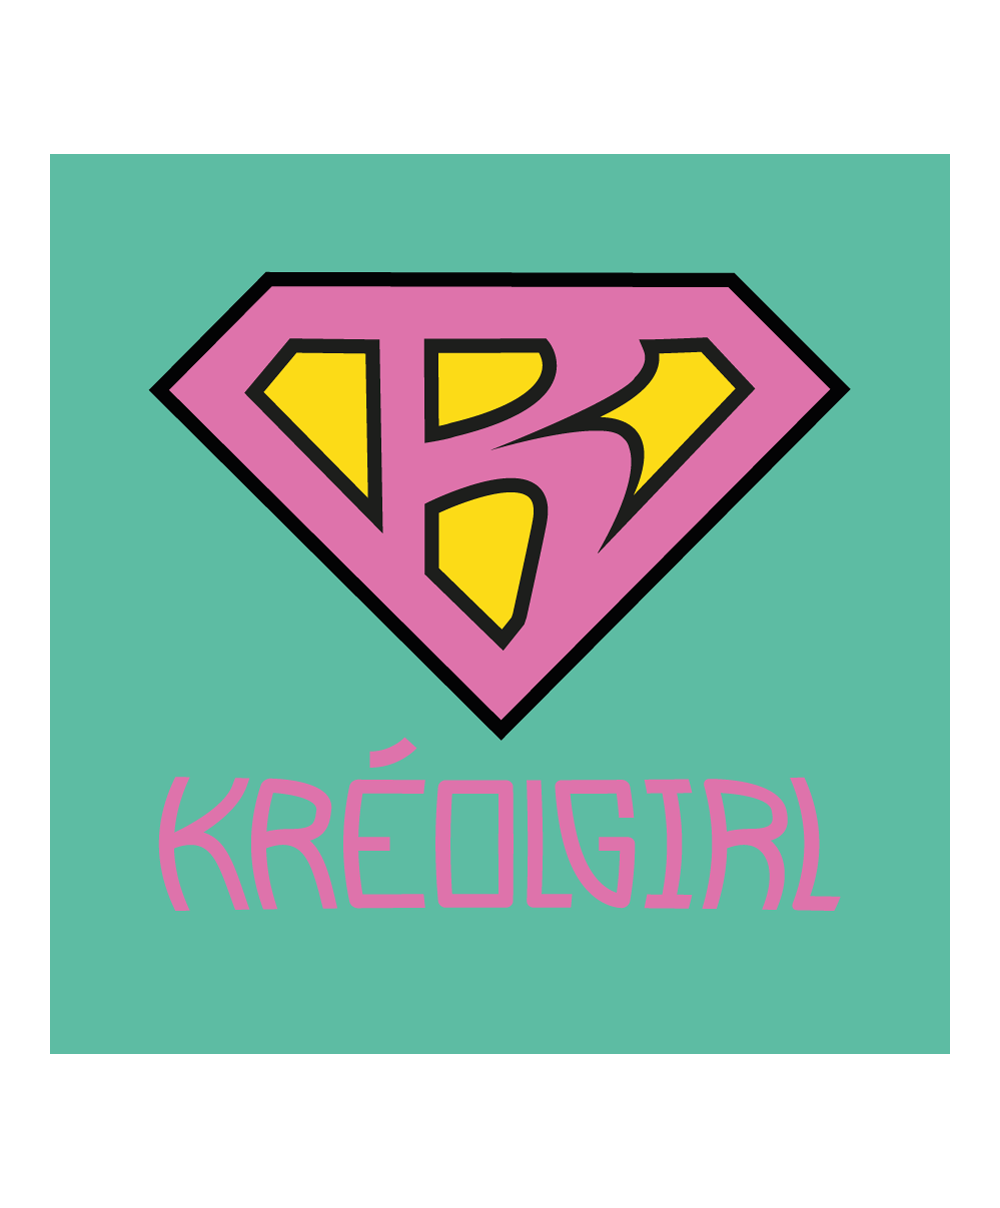 Kréolgirl femme